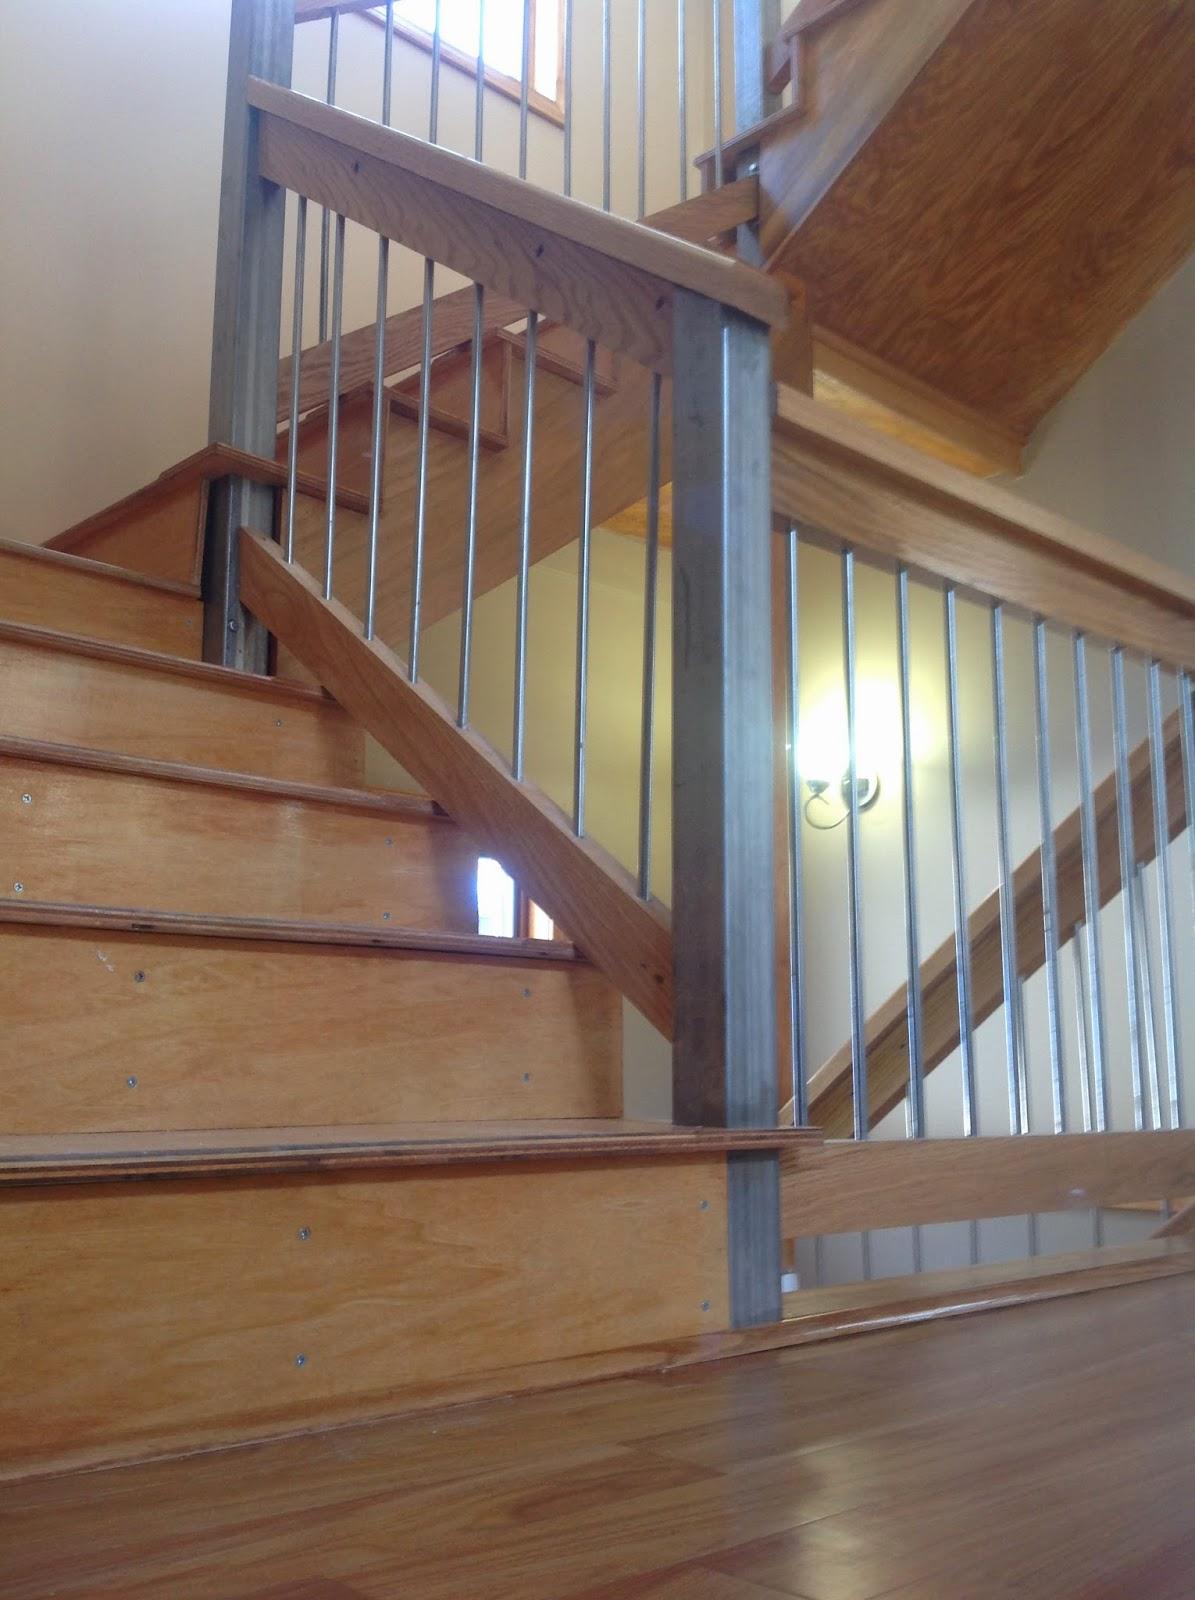 Maintenance free decking composite decking railing deck repair maintenance free decking composite decking railing deck repair boston massachusetts nvjuhfo Gallery